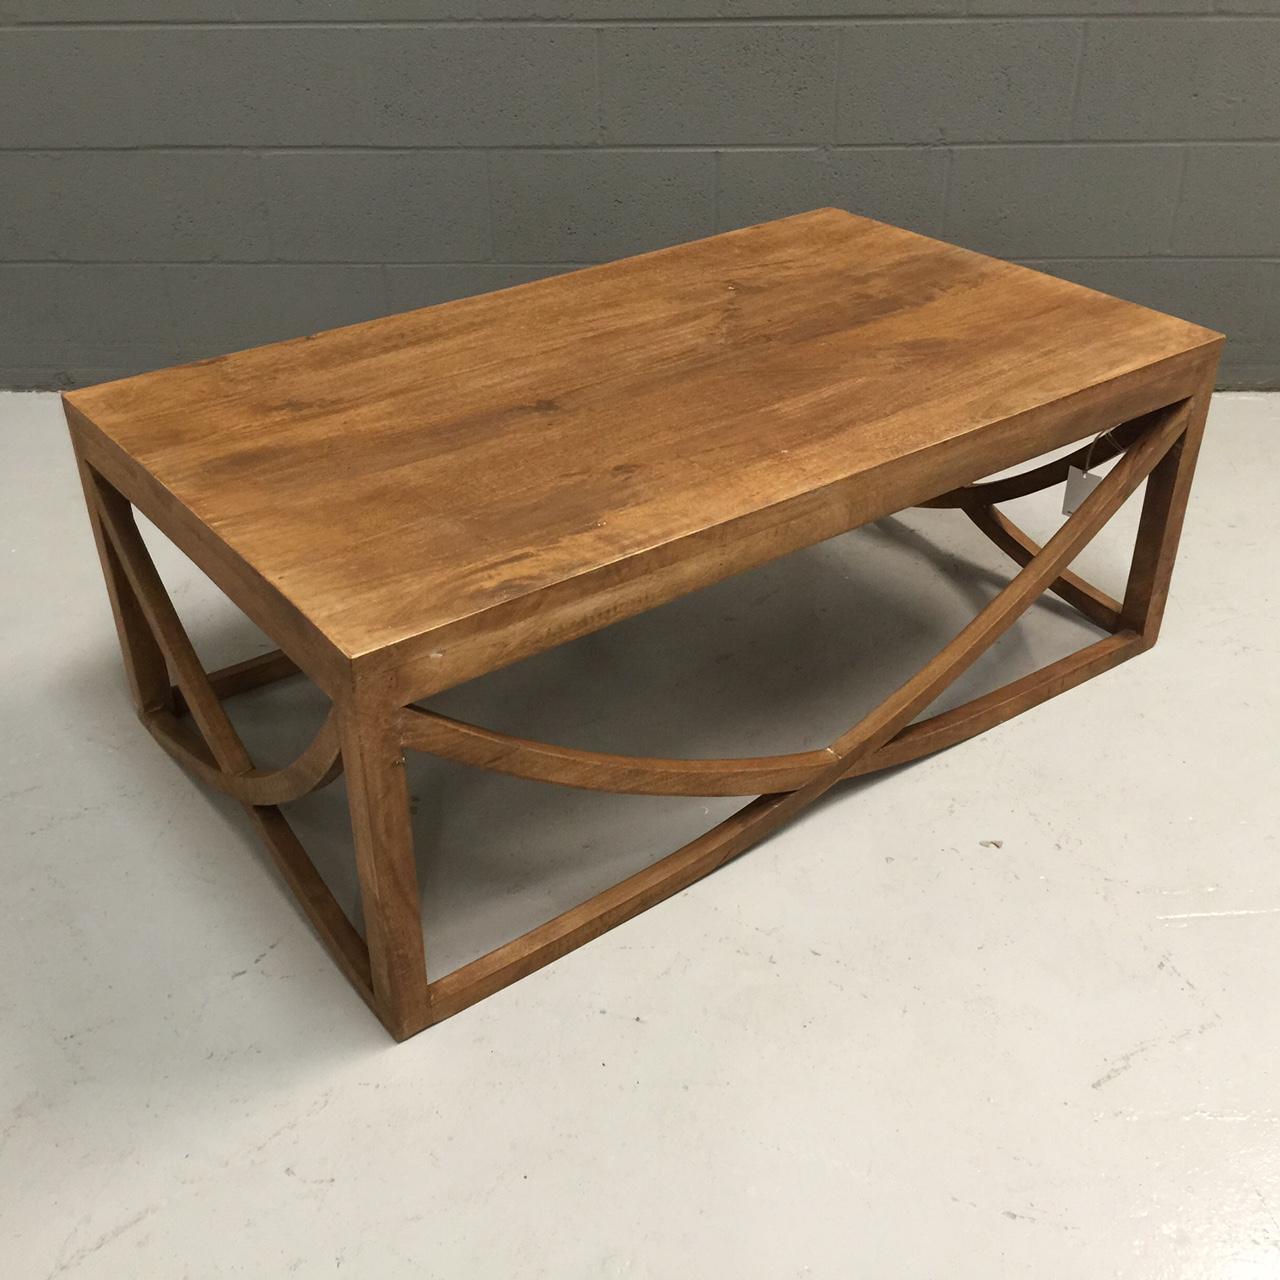 399 sofa store on thompson lane floating in living room u shape cross coffee table nadeau nashville